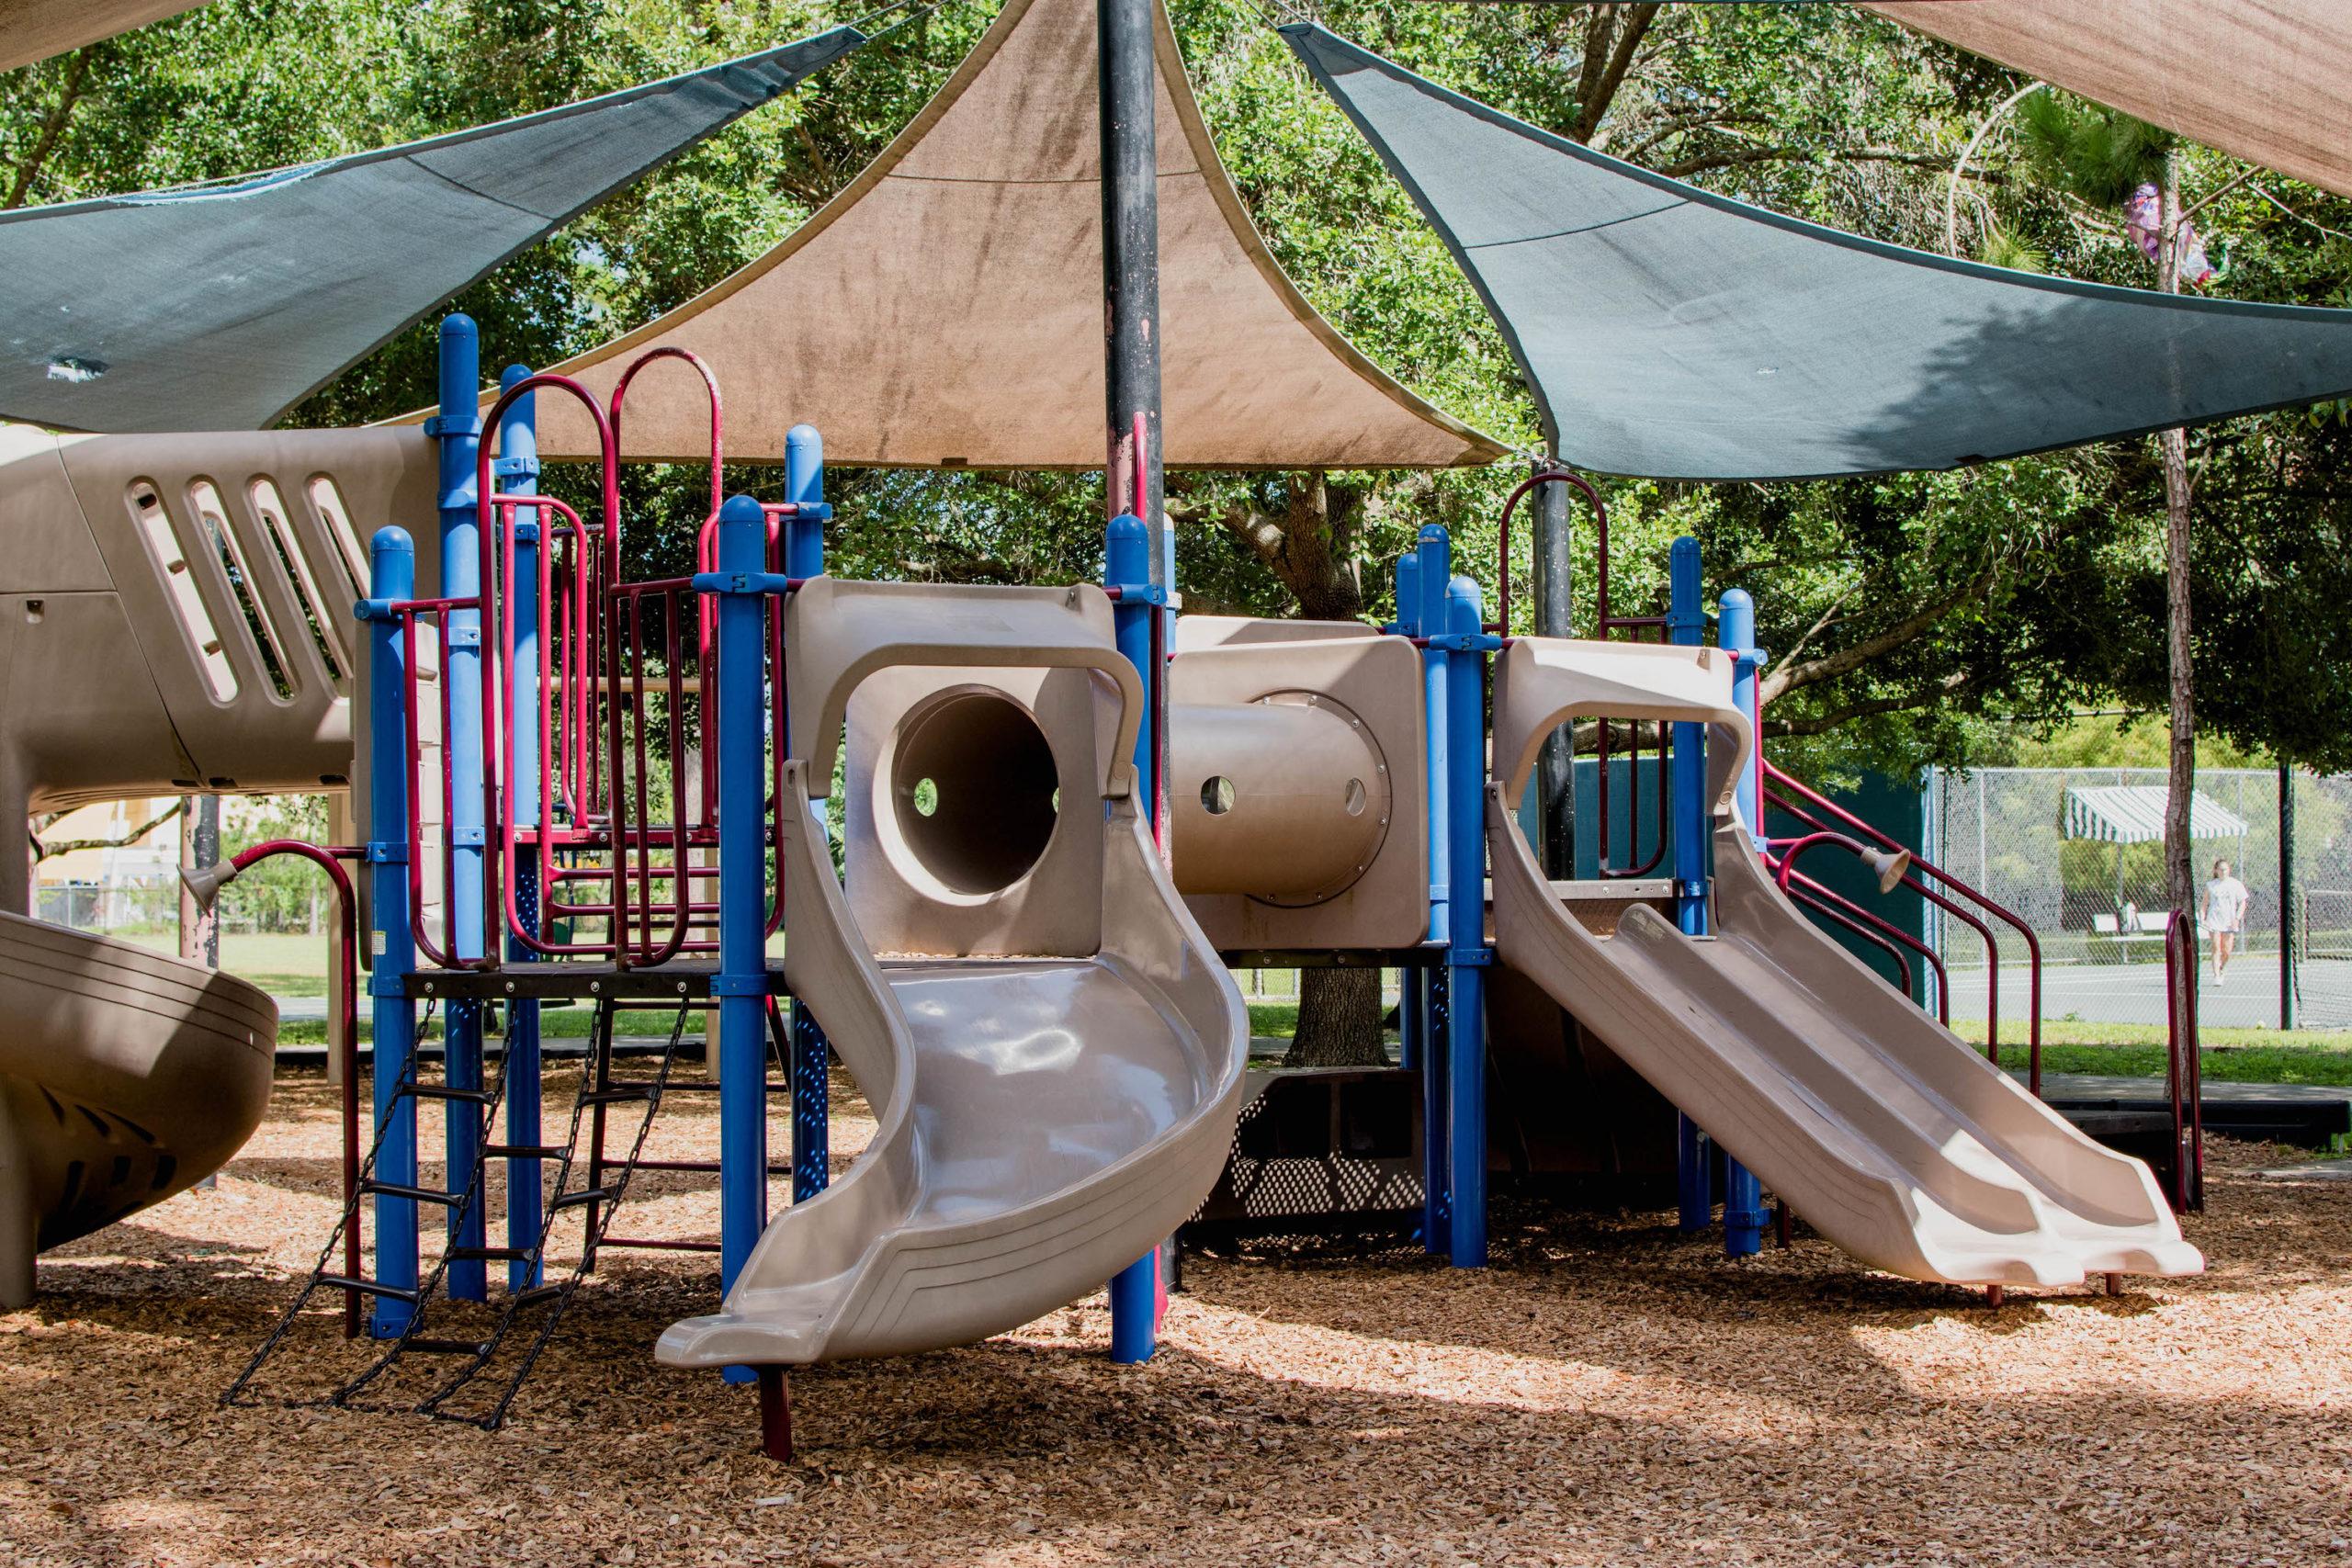 Phelps Park Playground in Winter Park, Florida.